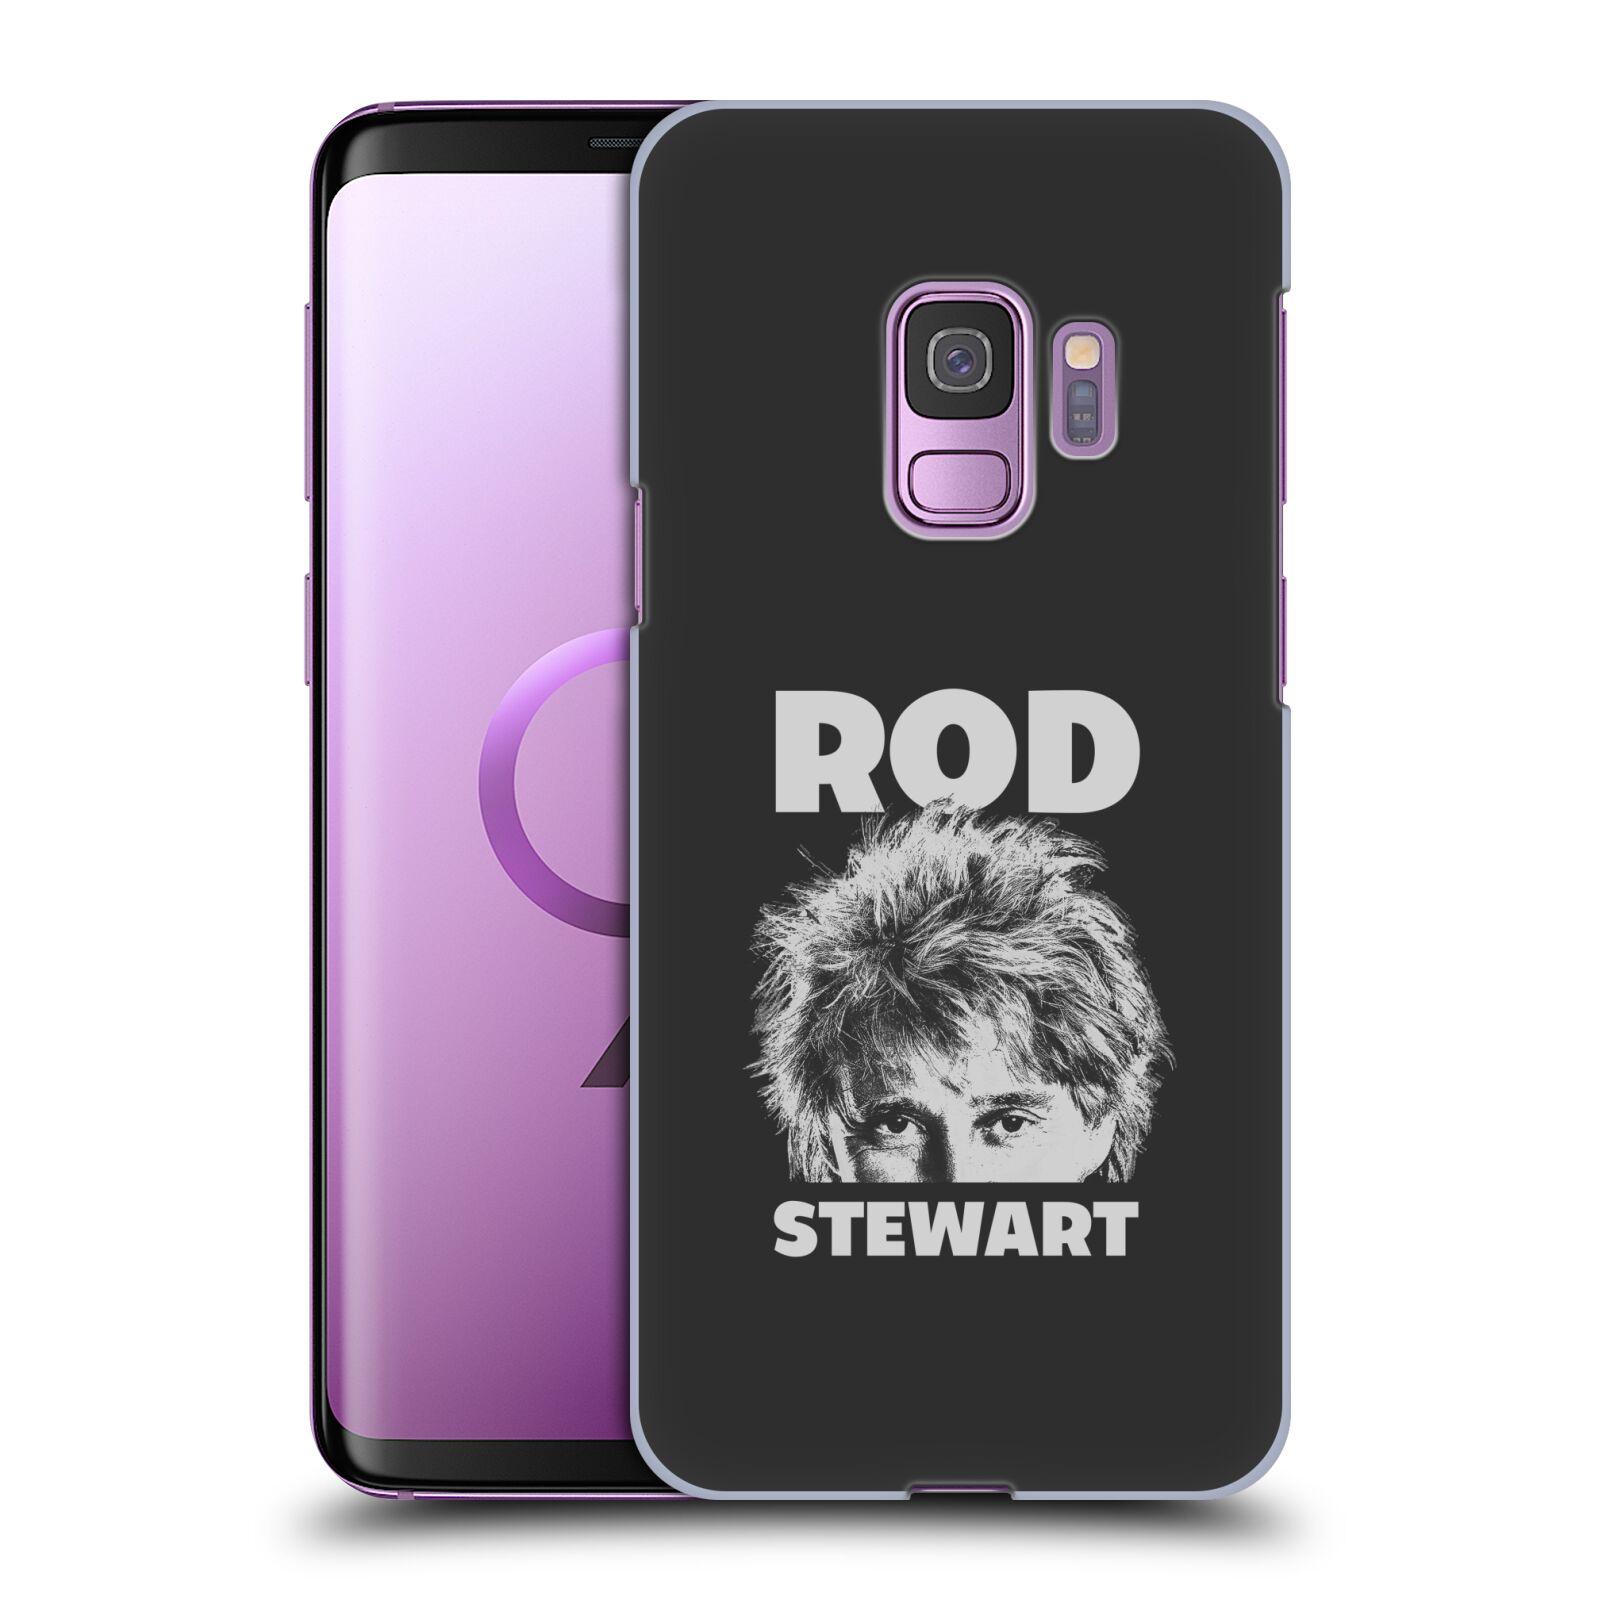 UFFICIALE-ROD-STEWART-ART-HARD-BACK-CASE-per-Samsung-Telefoni-1